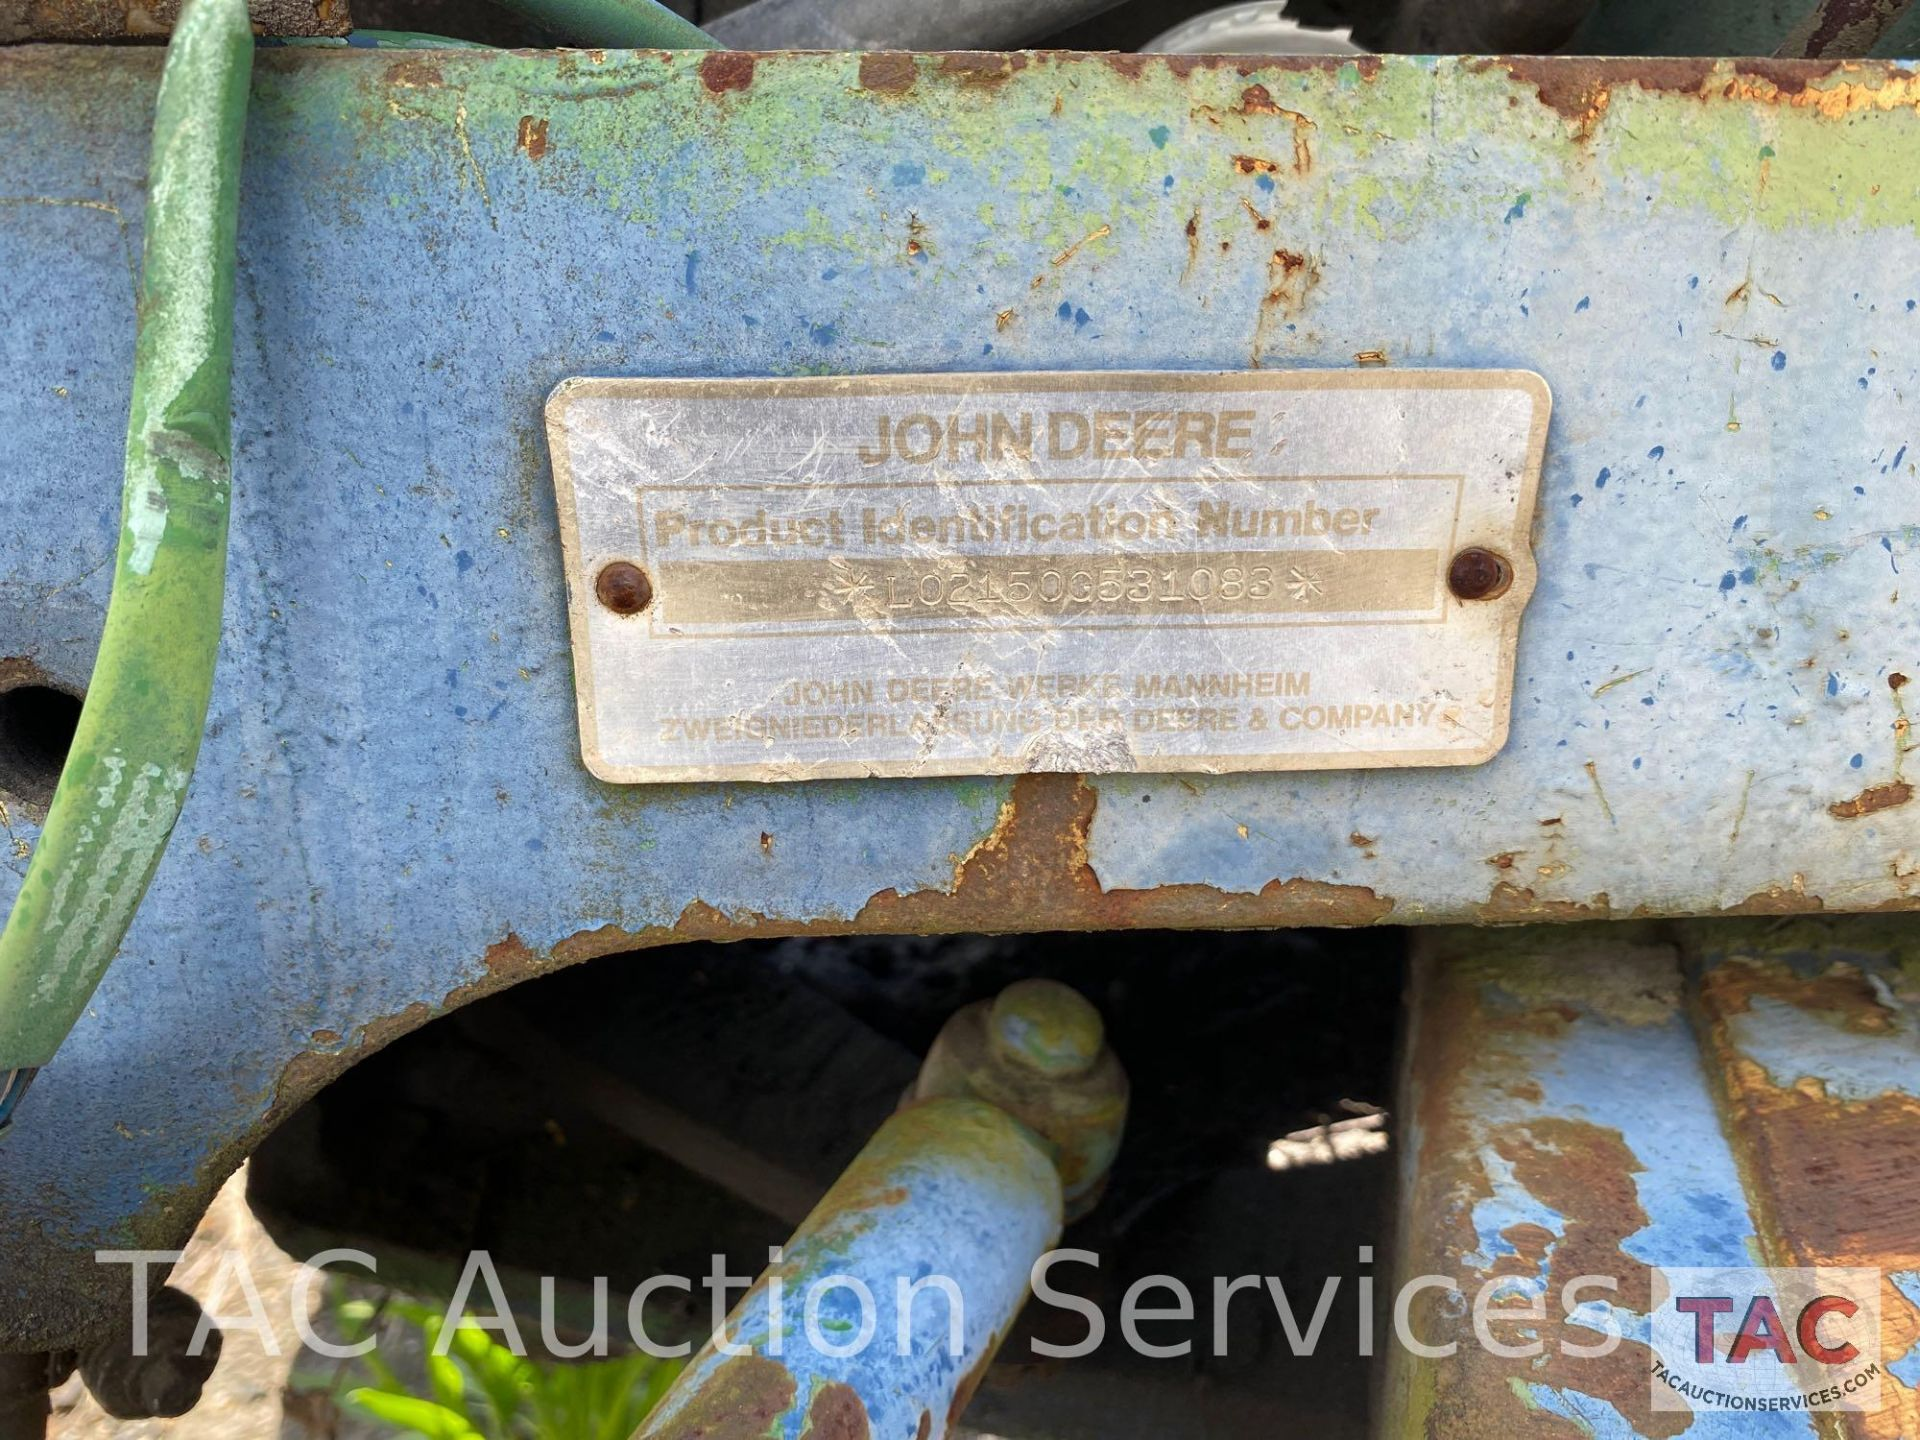 John Deere 2150 Farm Tractor - Image 34 of 34